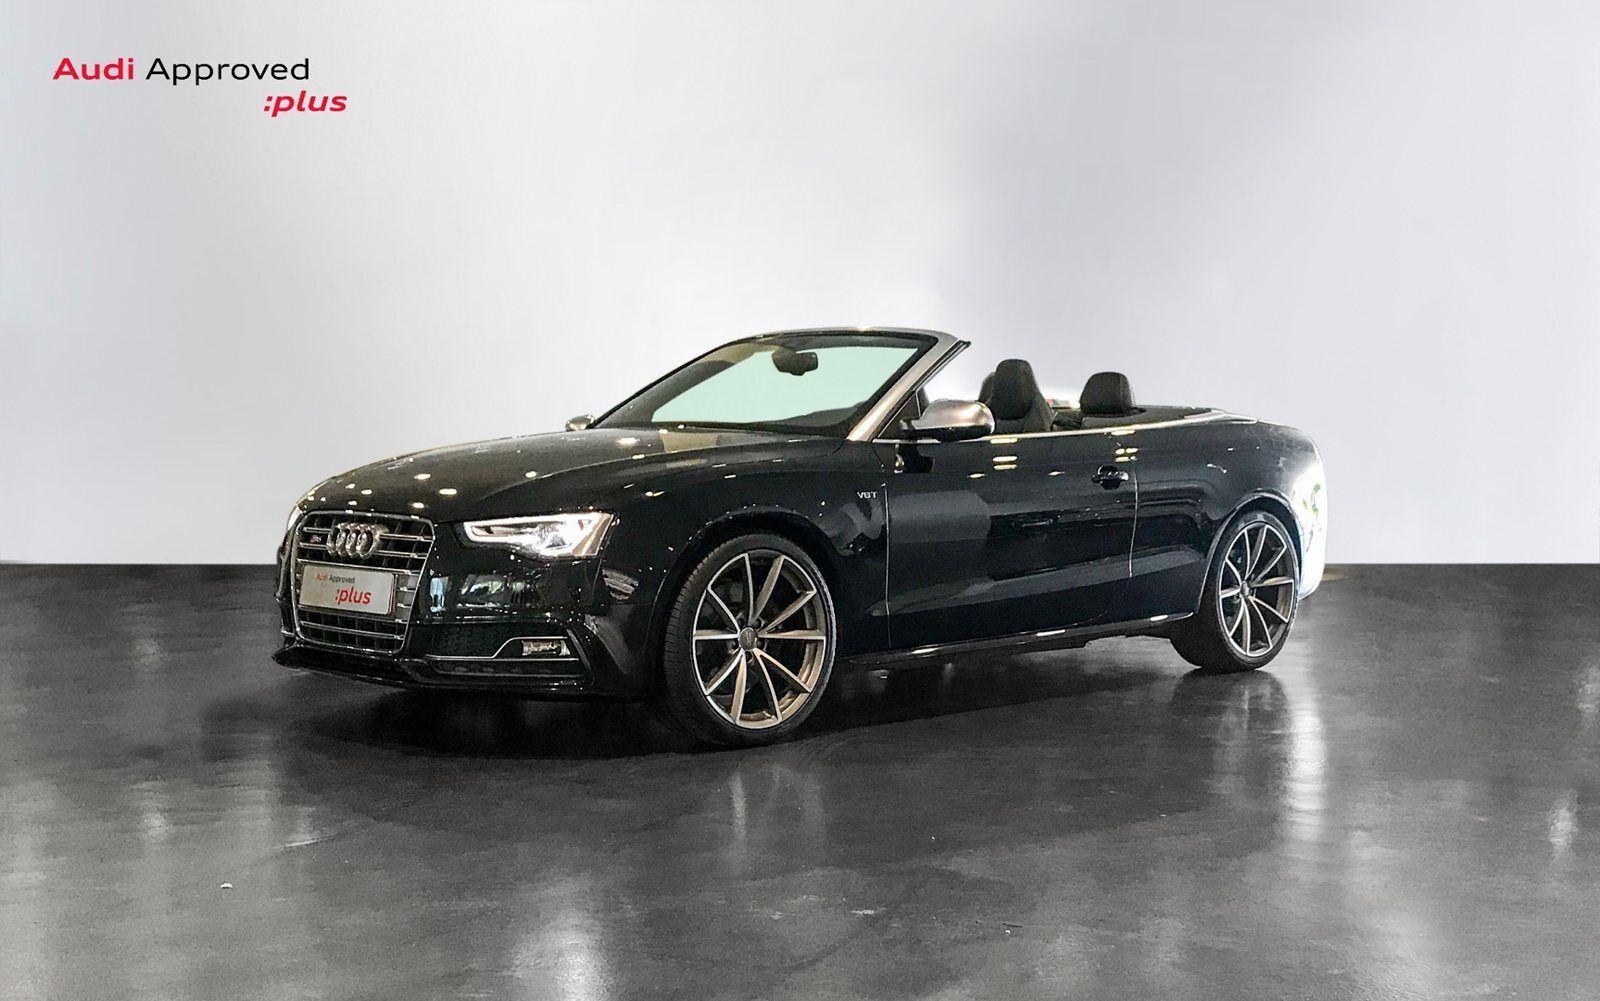 Audi S5 3,0 TFSi Cabriolet quattro S-tr. 2d - 750.000 kr.